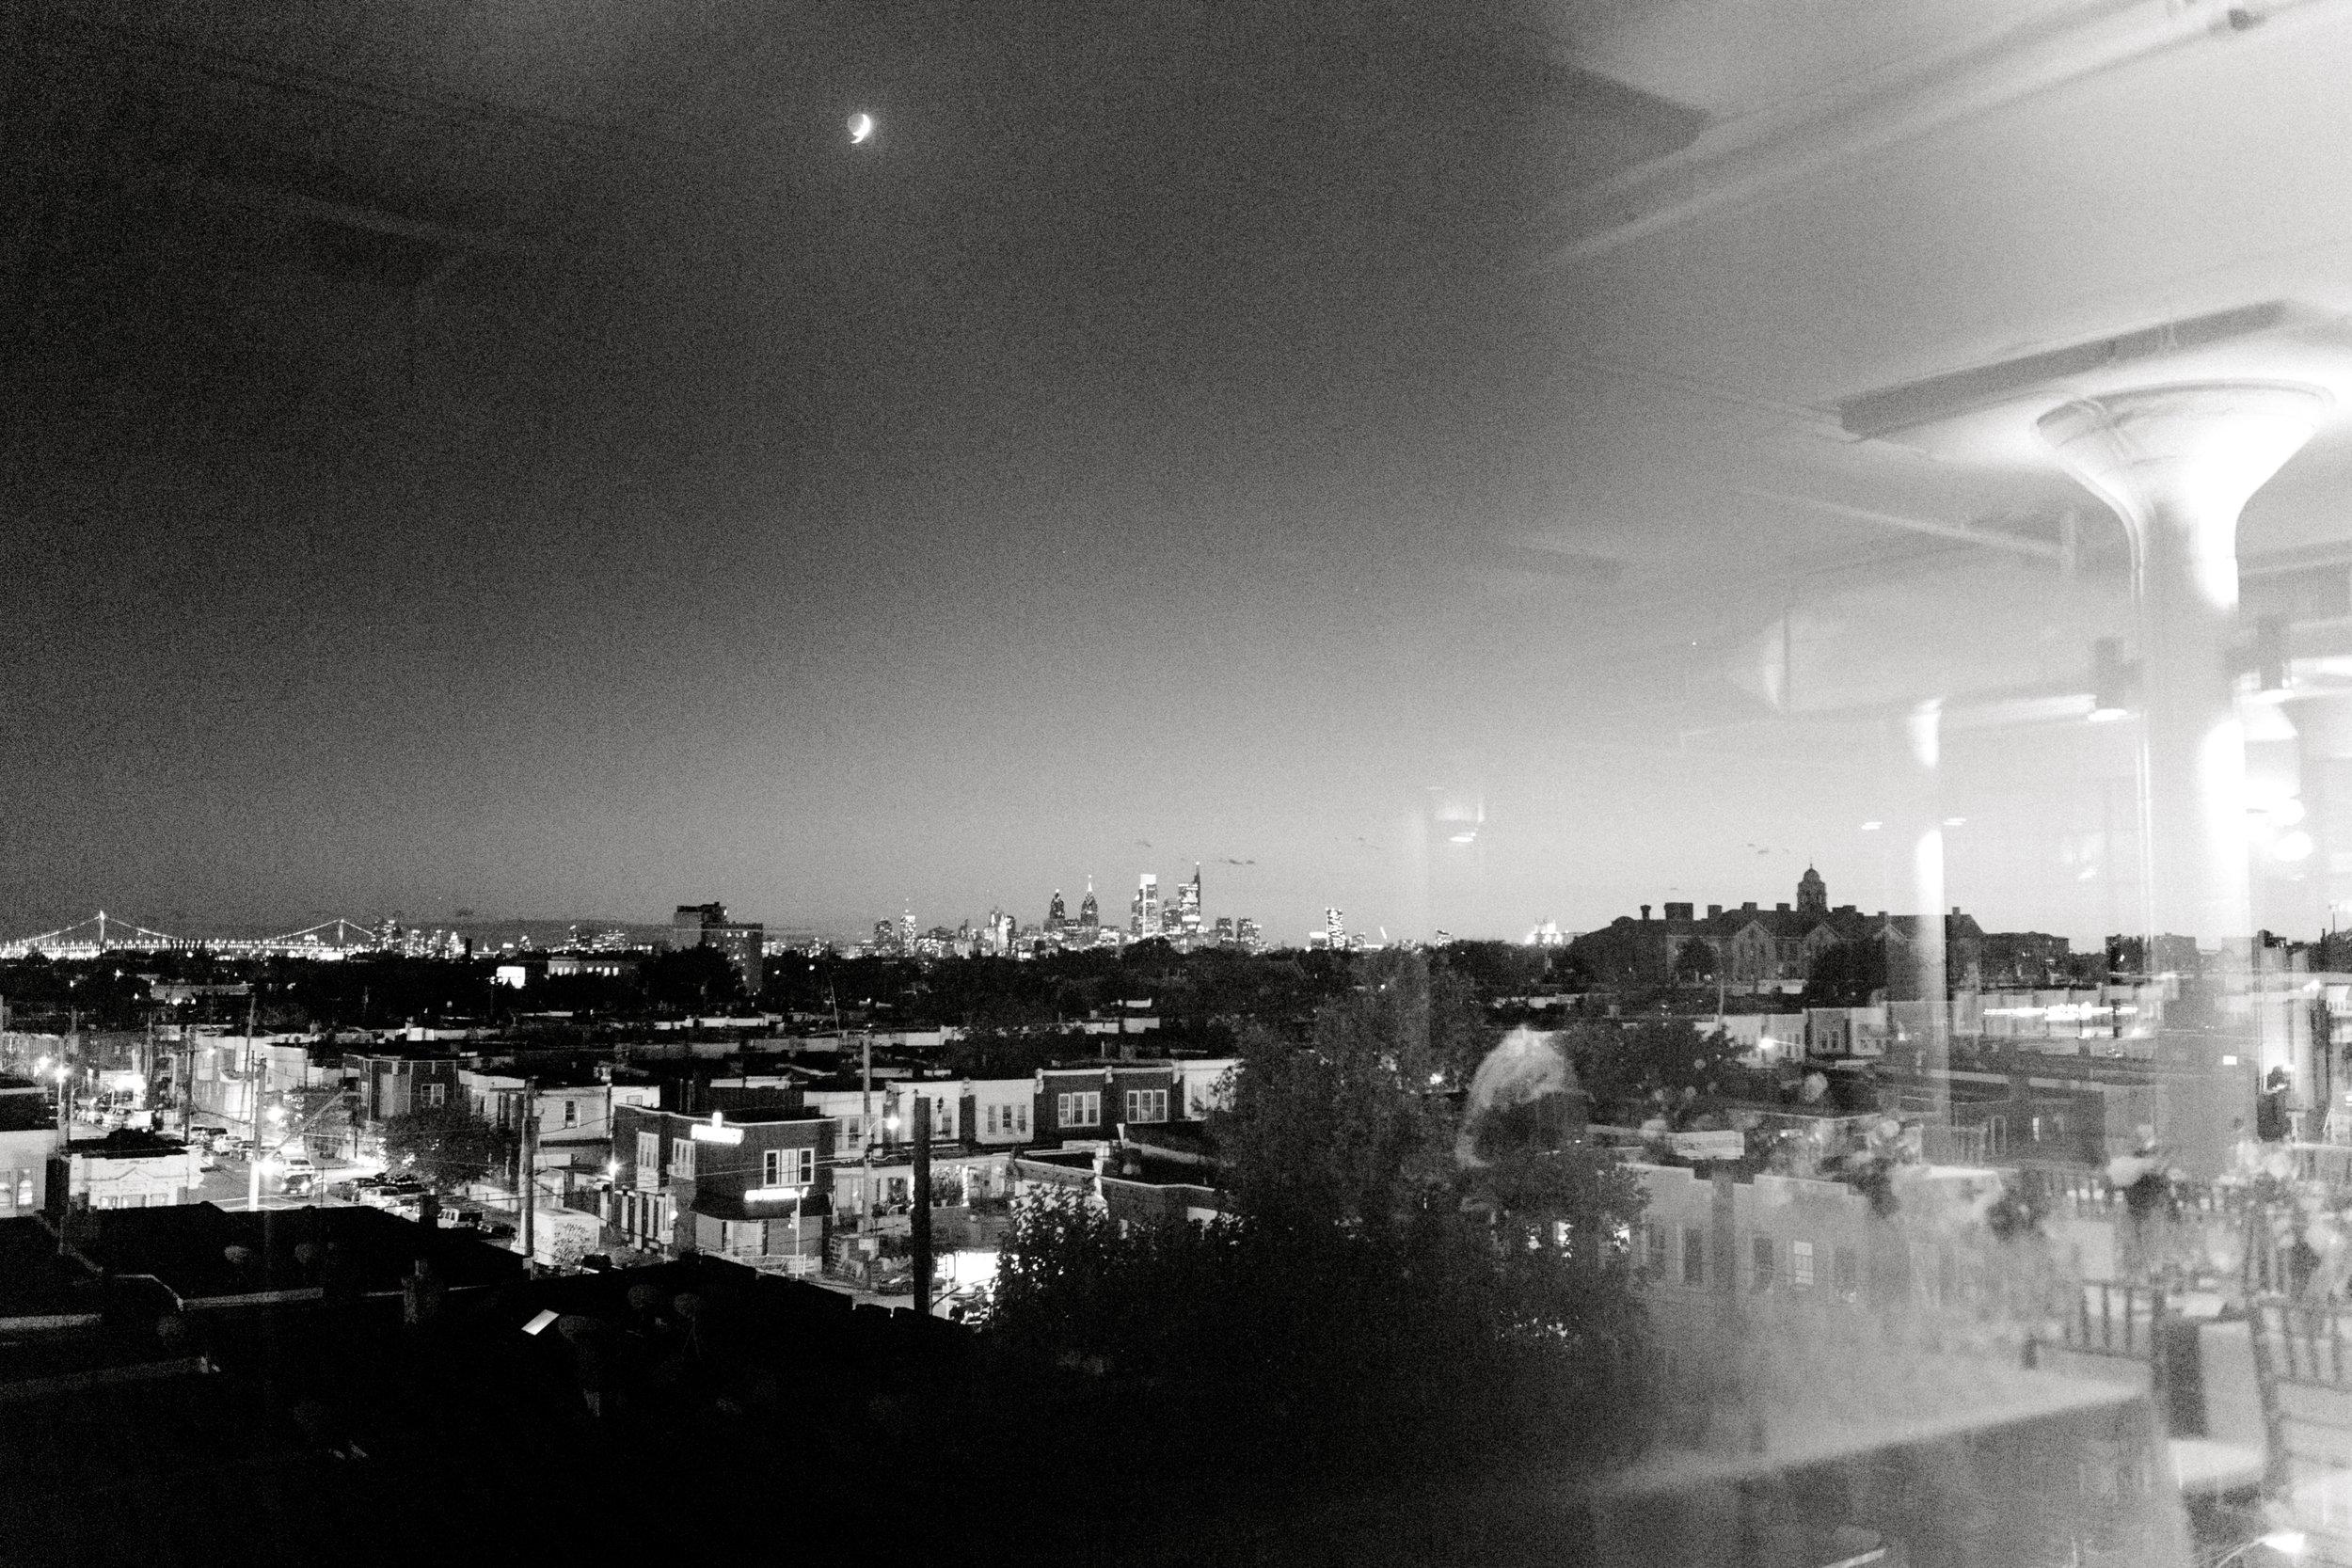 FAME, Philadelphia venue with a skyline view